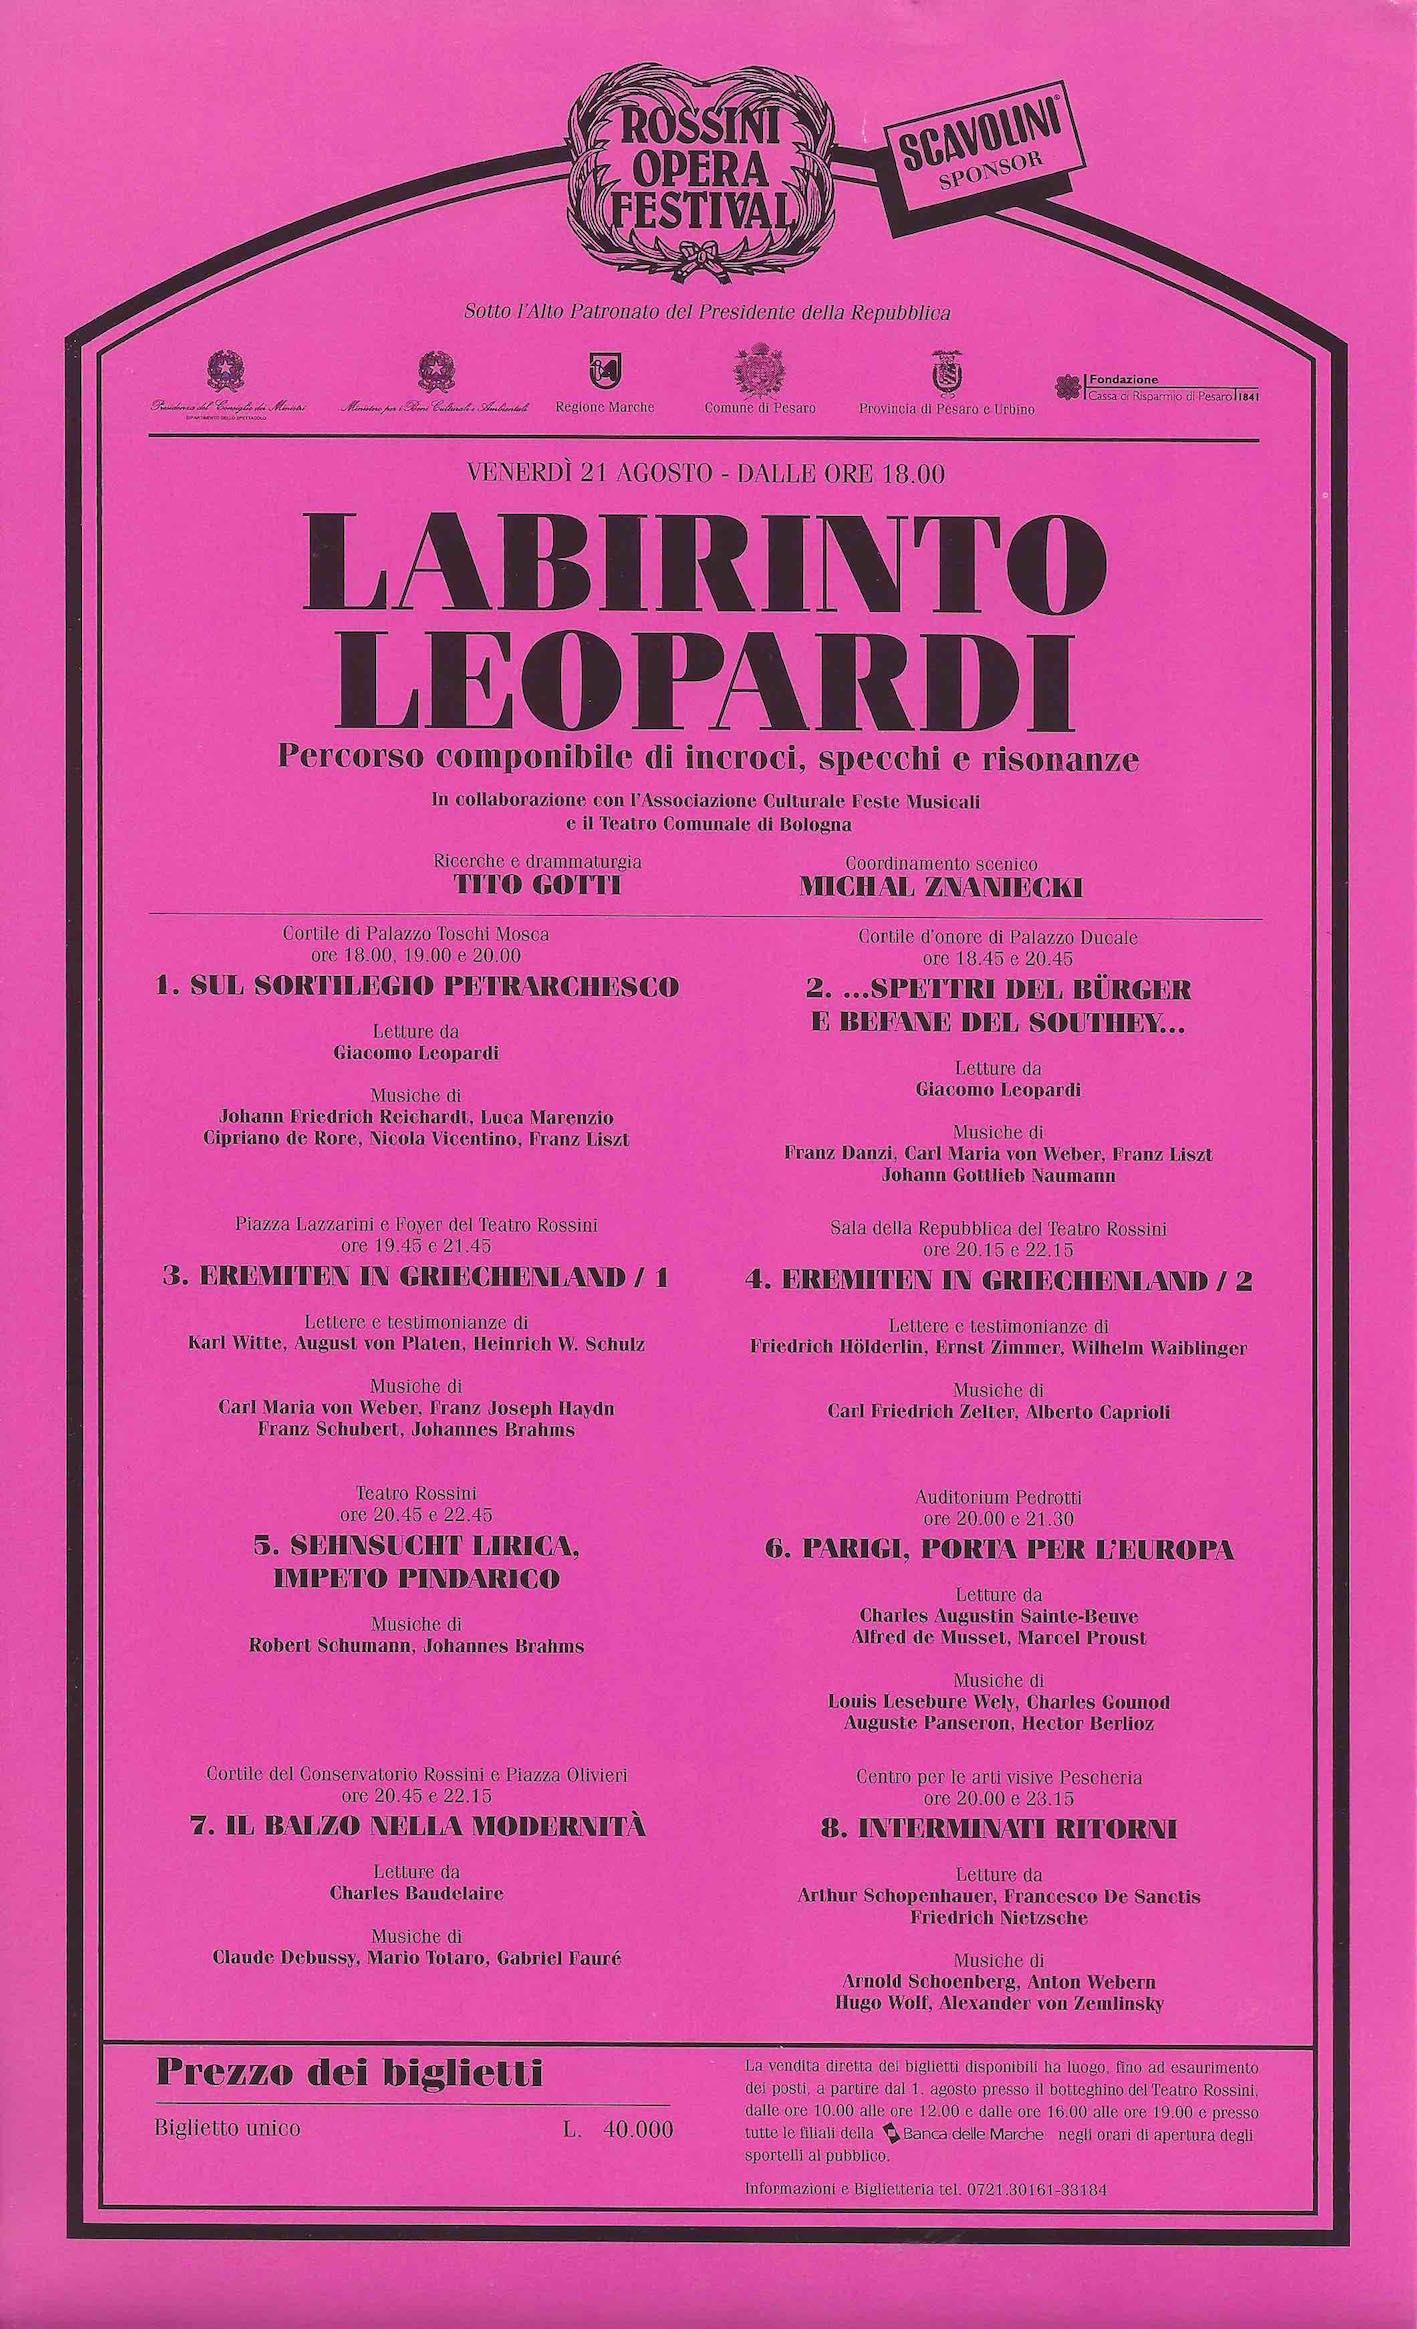 LABIRINTO LEOPARDI - ROSSINI OPERA FESTIVAL 1998